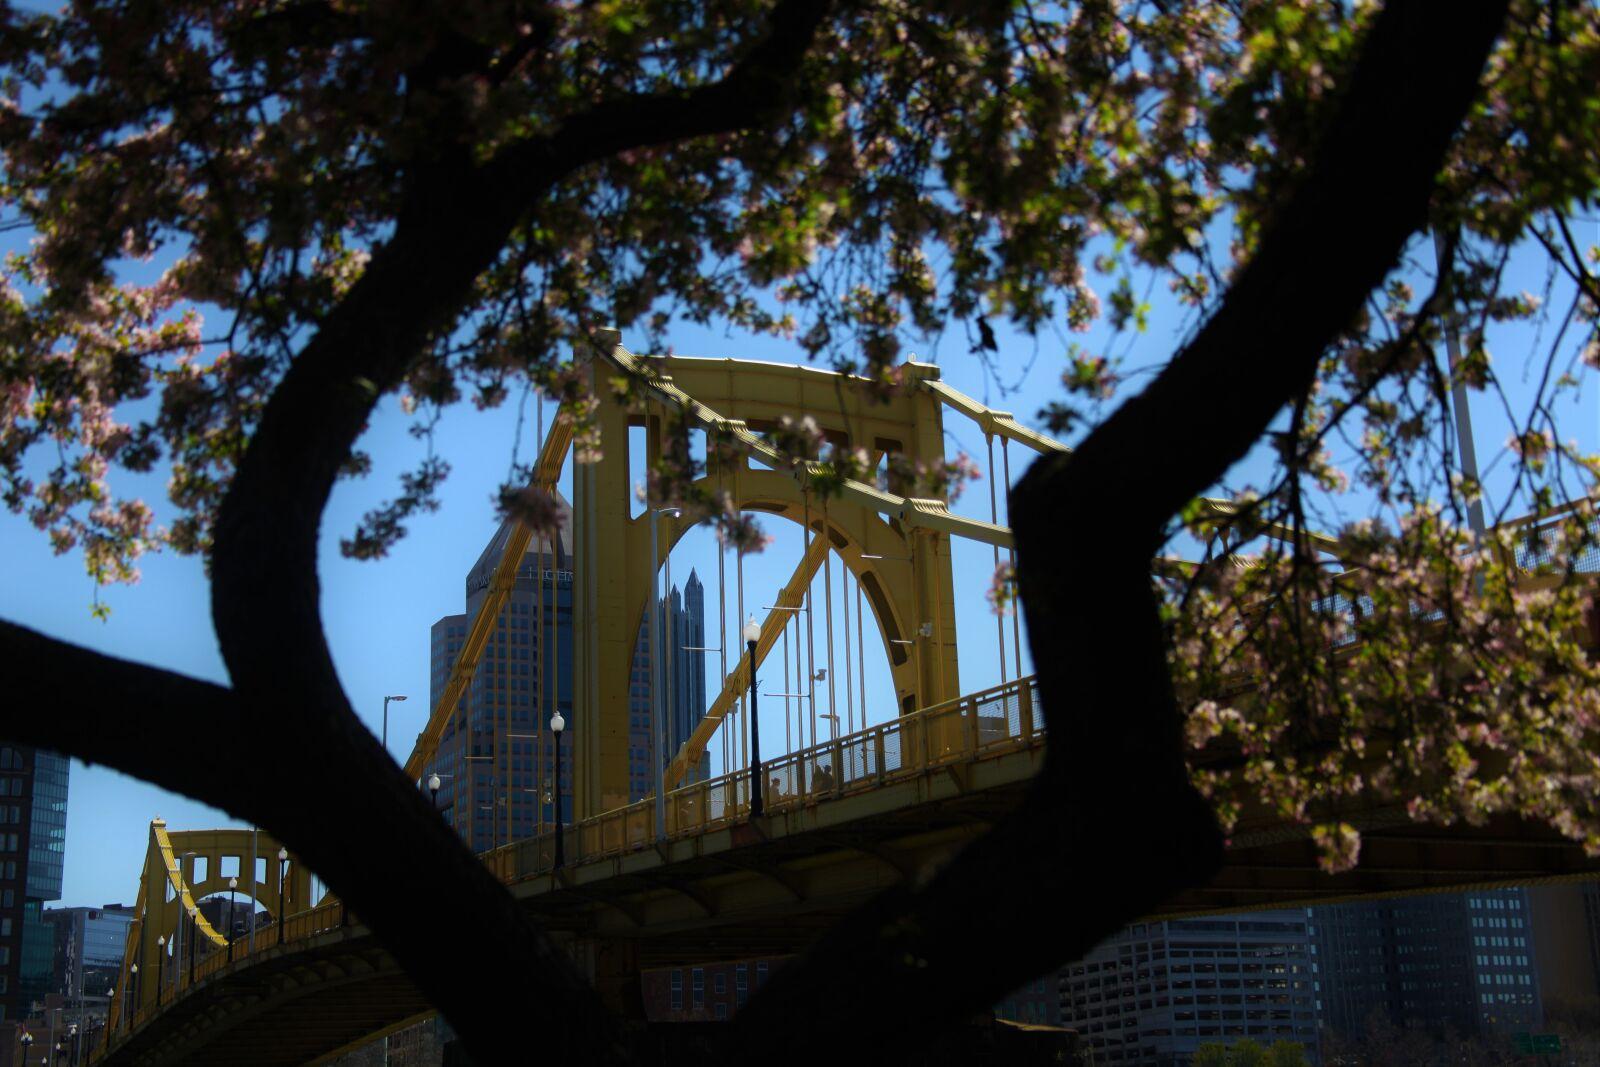 blue, sky, bridge, downtown, Canon EOS 5D MARK II, Canon EF 28-135mm f/3.5-5.6 IS